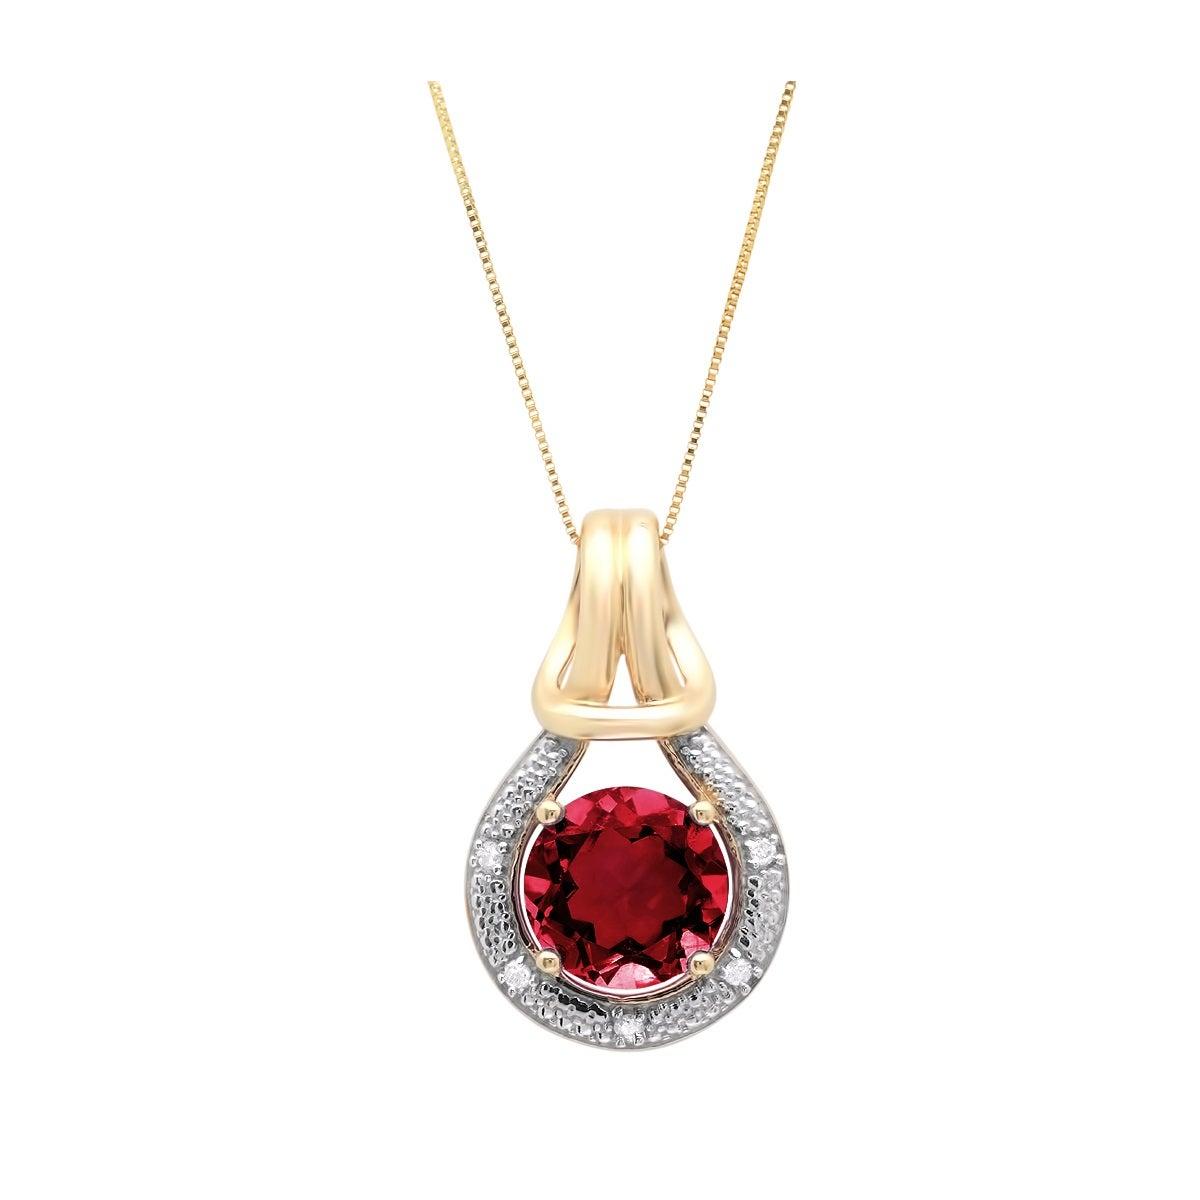 Beautiful 10K Karat Two Tone Gold Pendant Charm w Ruby Gemstones /& Diamonds